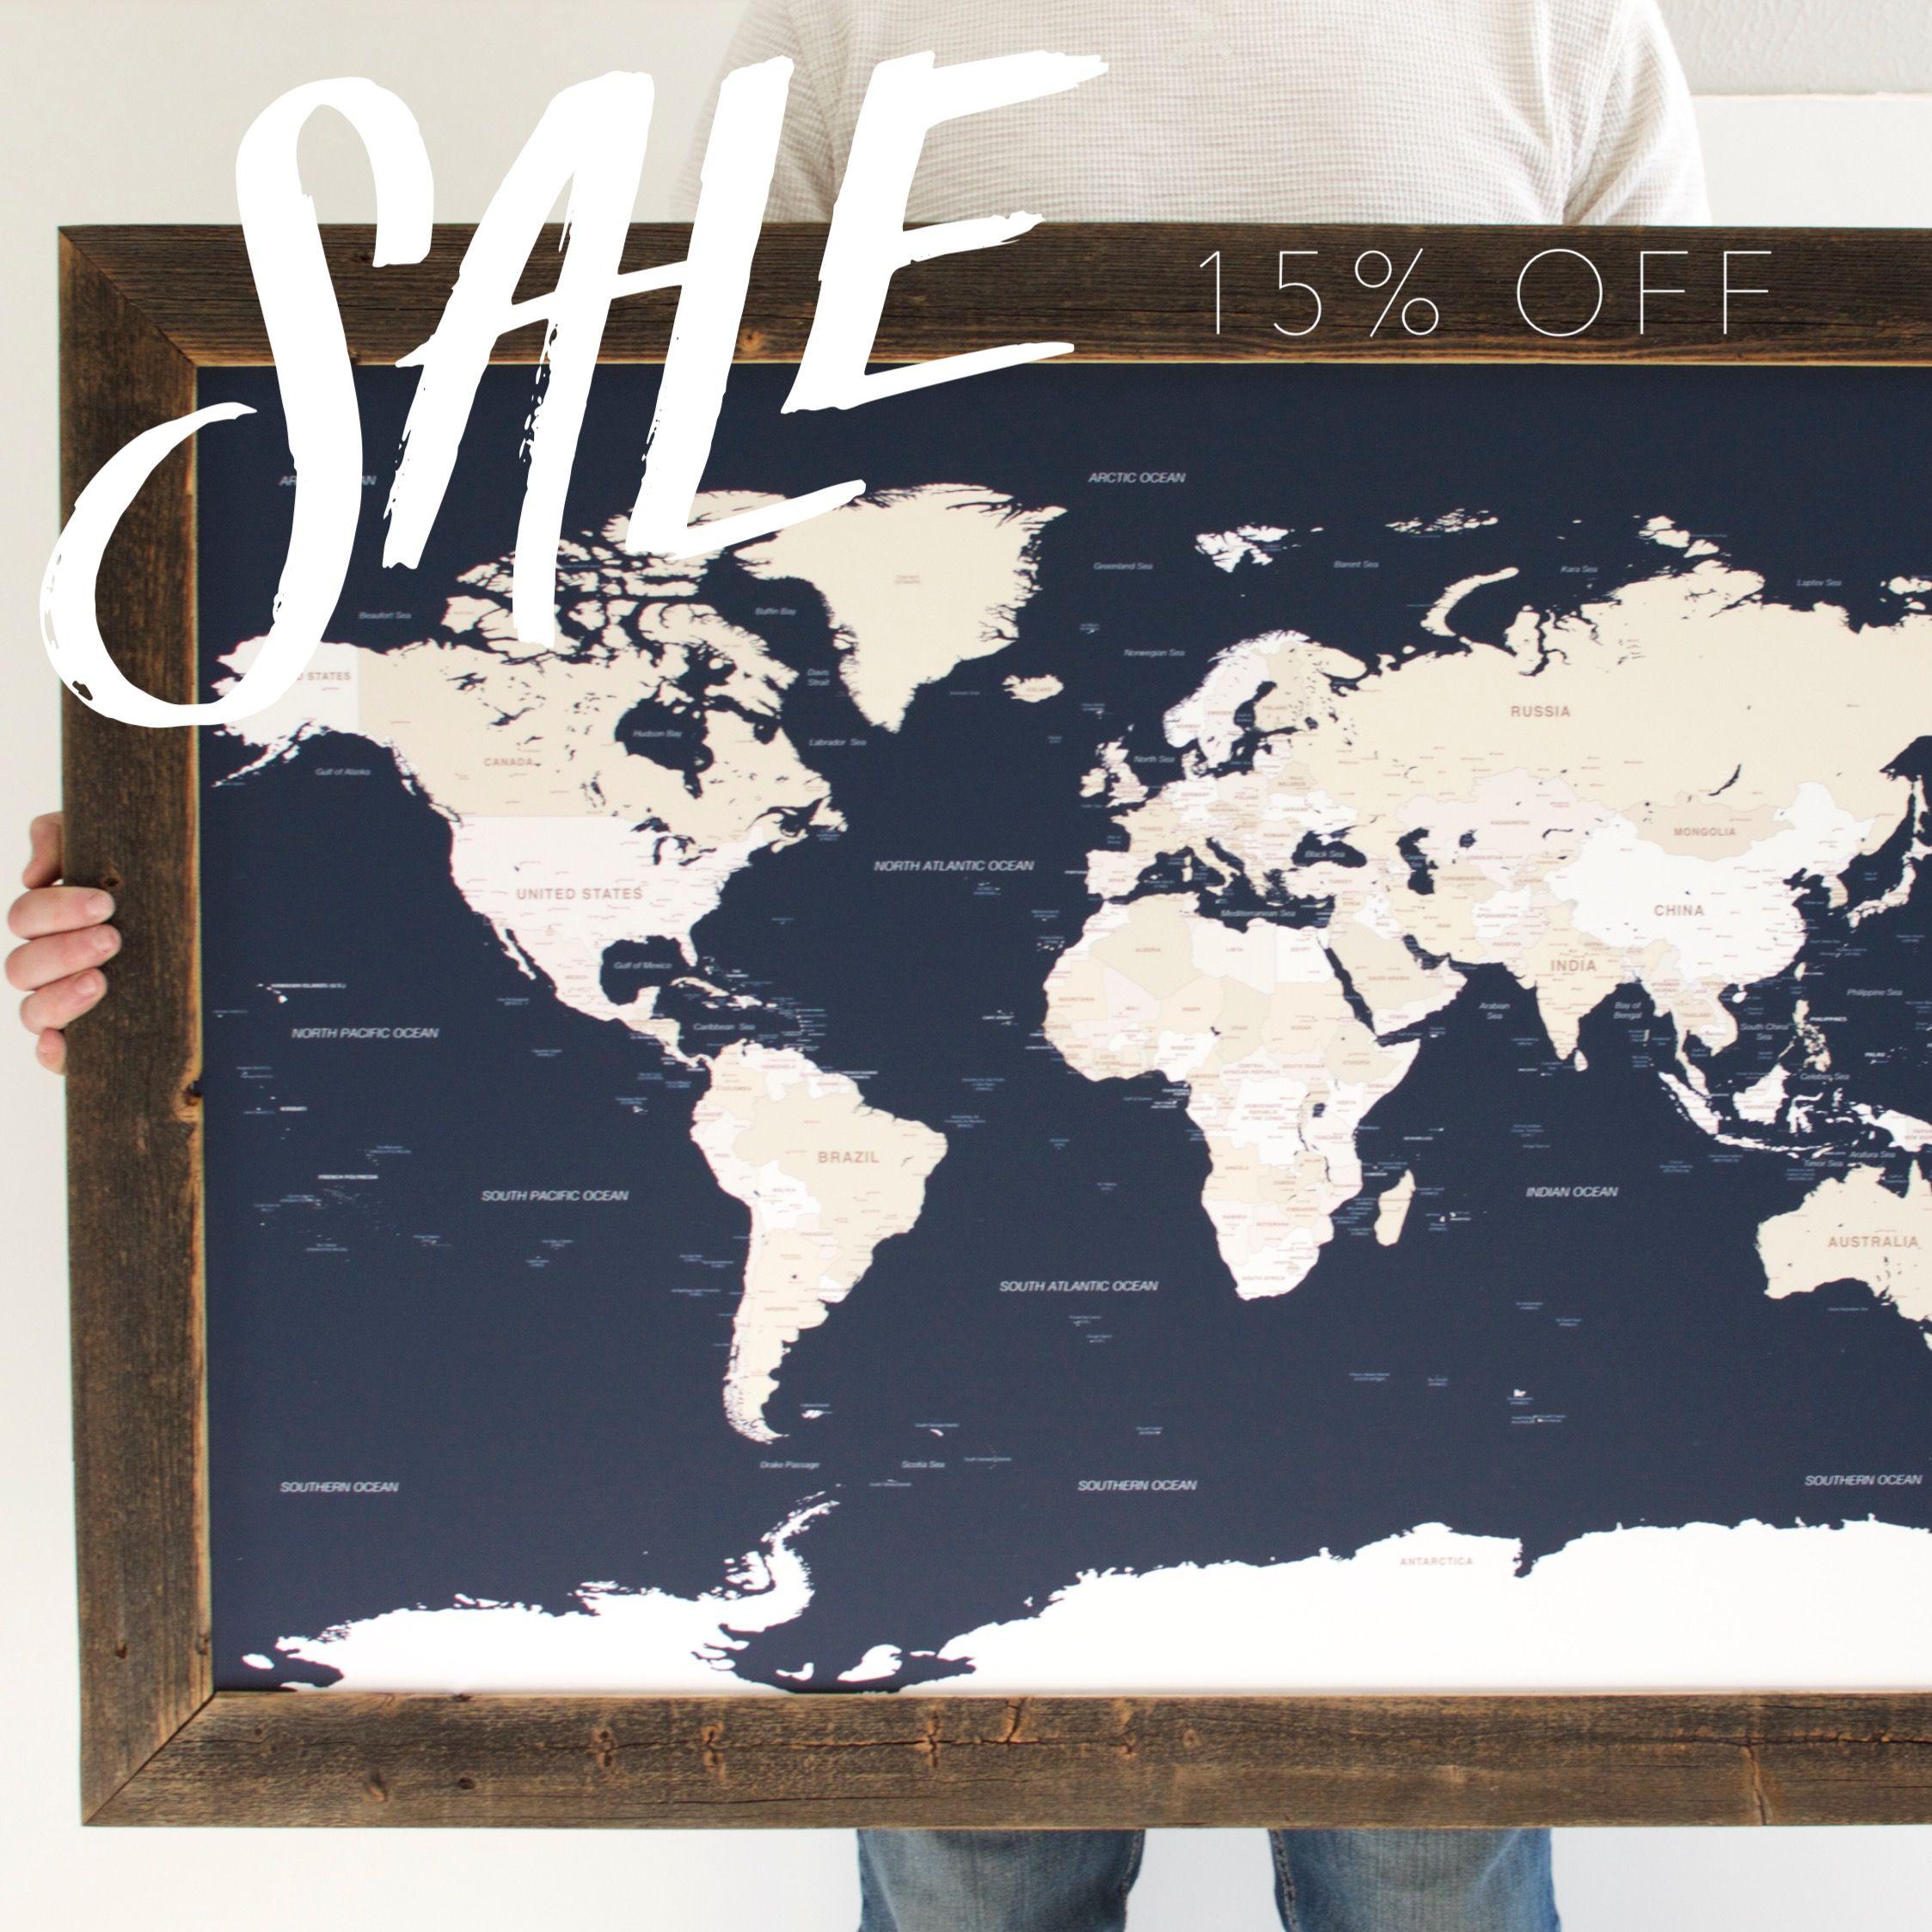 Cyber monday sale world travel map wayfaren pinterest cyber monday sale world travel map gumiabroncs Choice Image